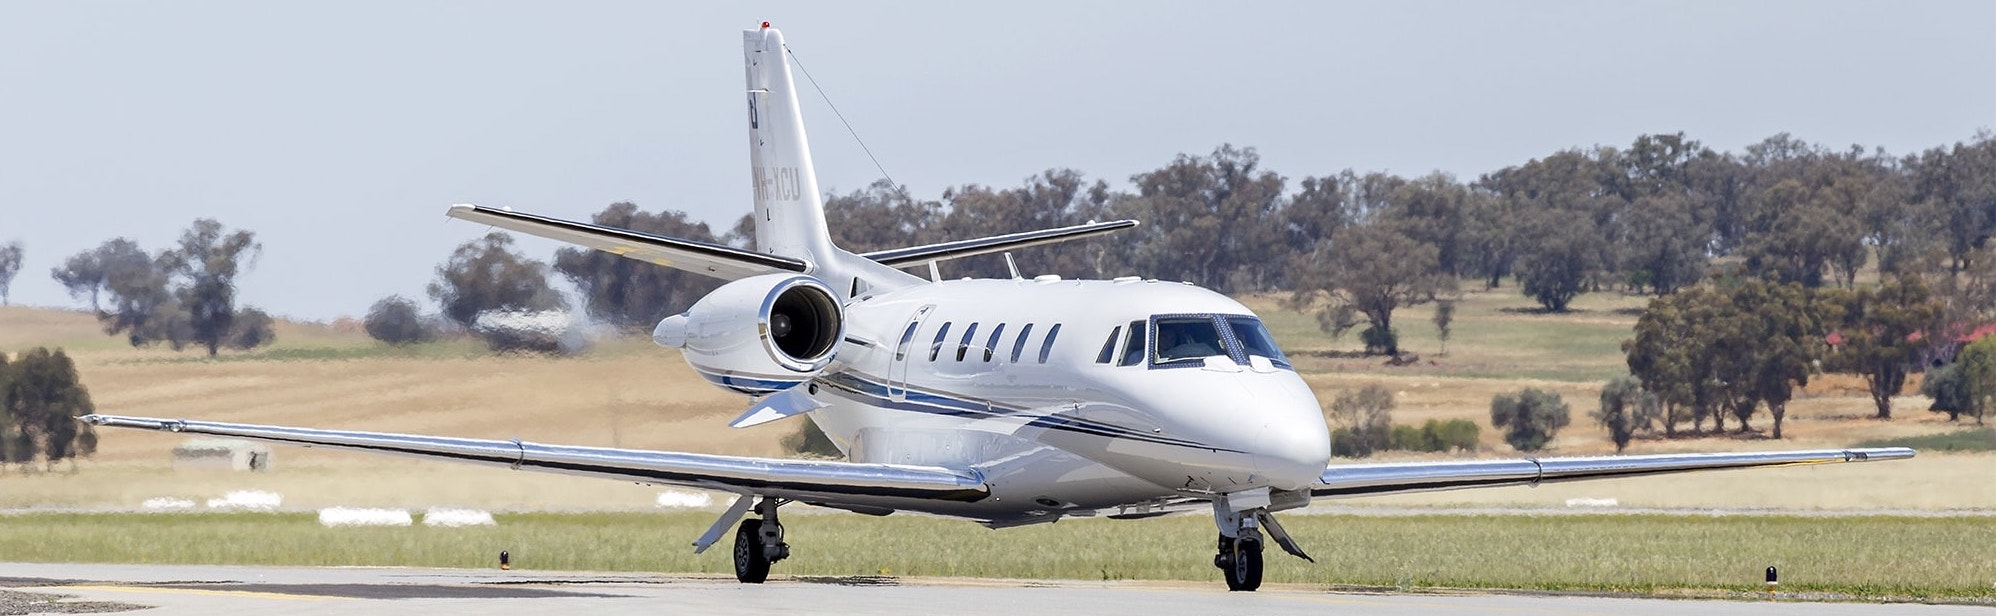 Cessna Citation Excel XL taxiing